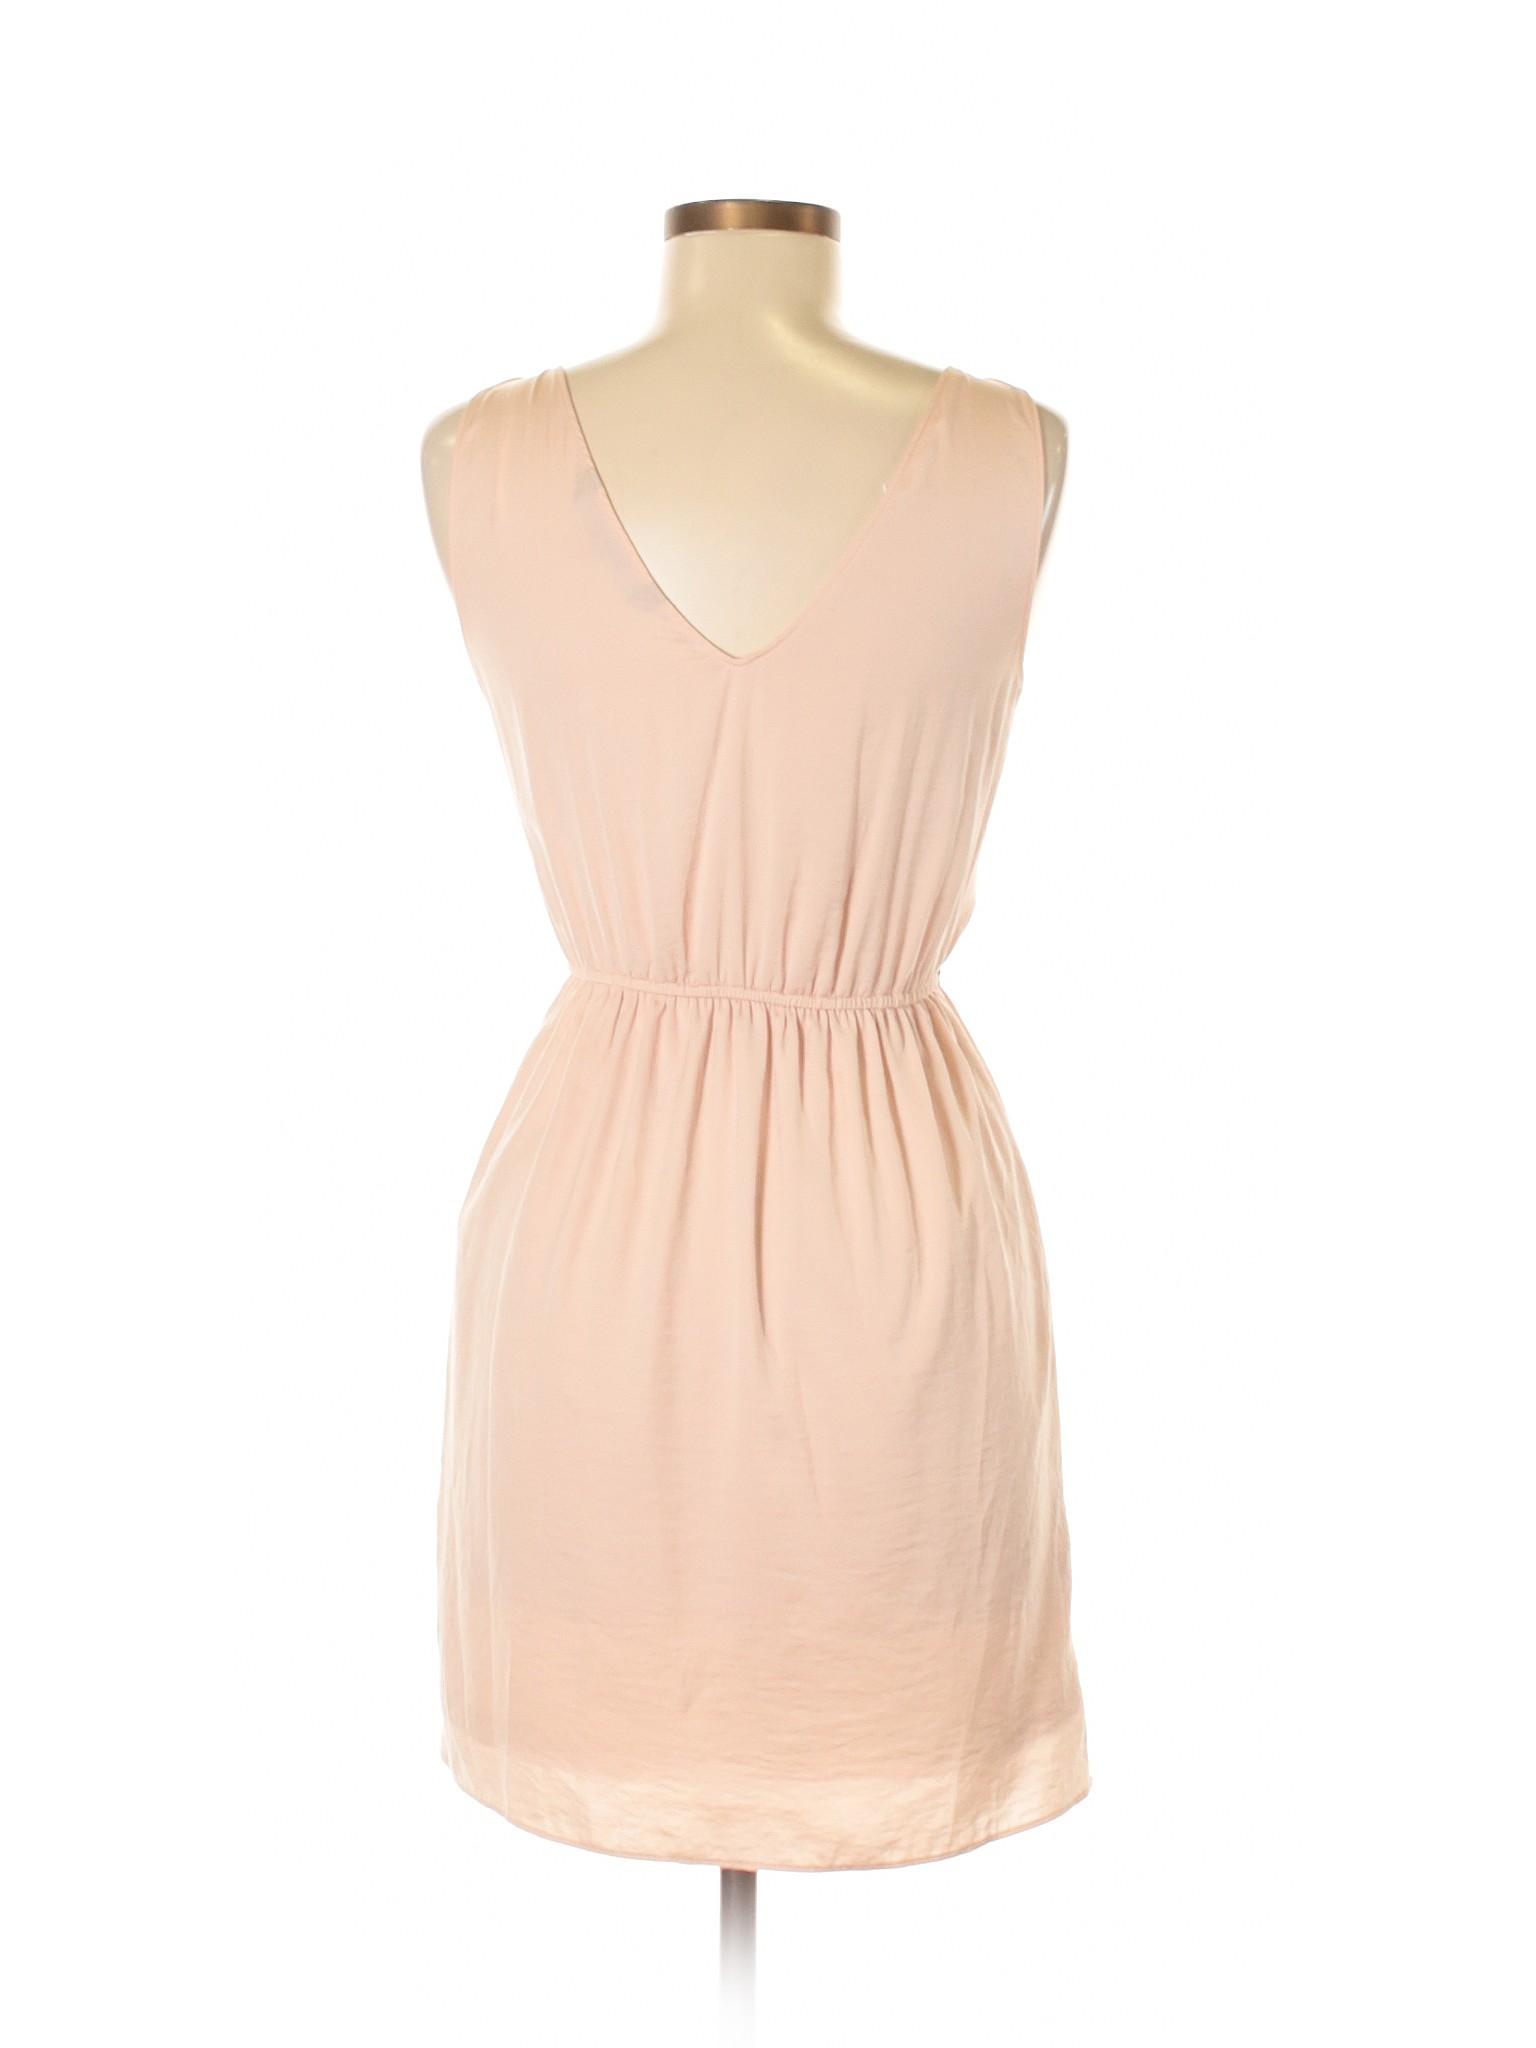 Trafaluc Dress Zara Selling by Casual BwZqnOx